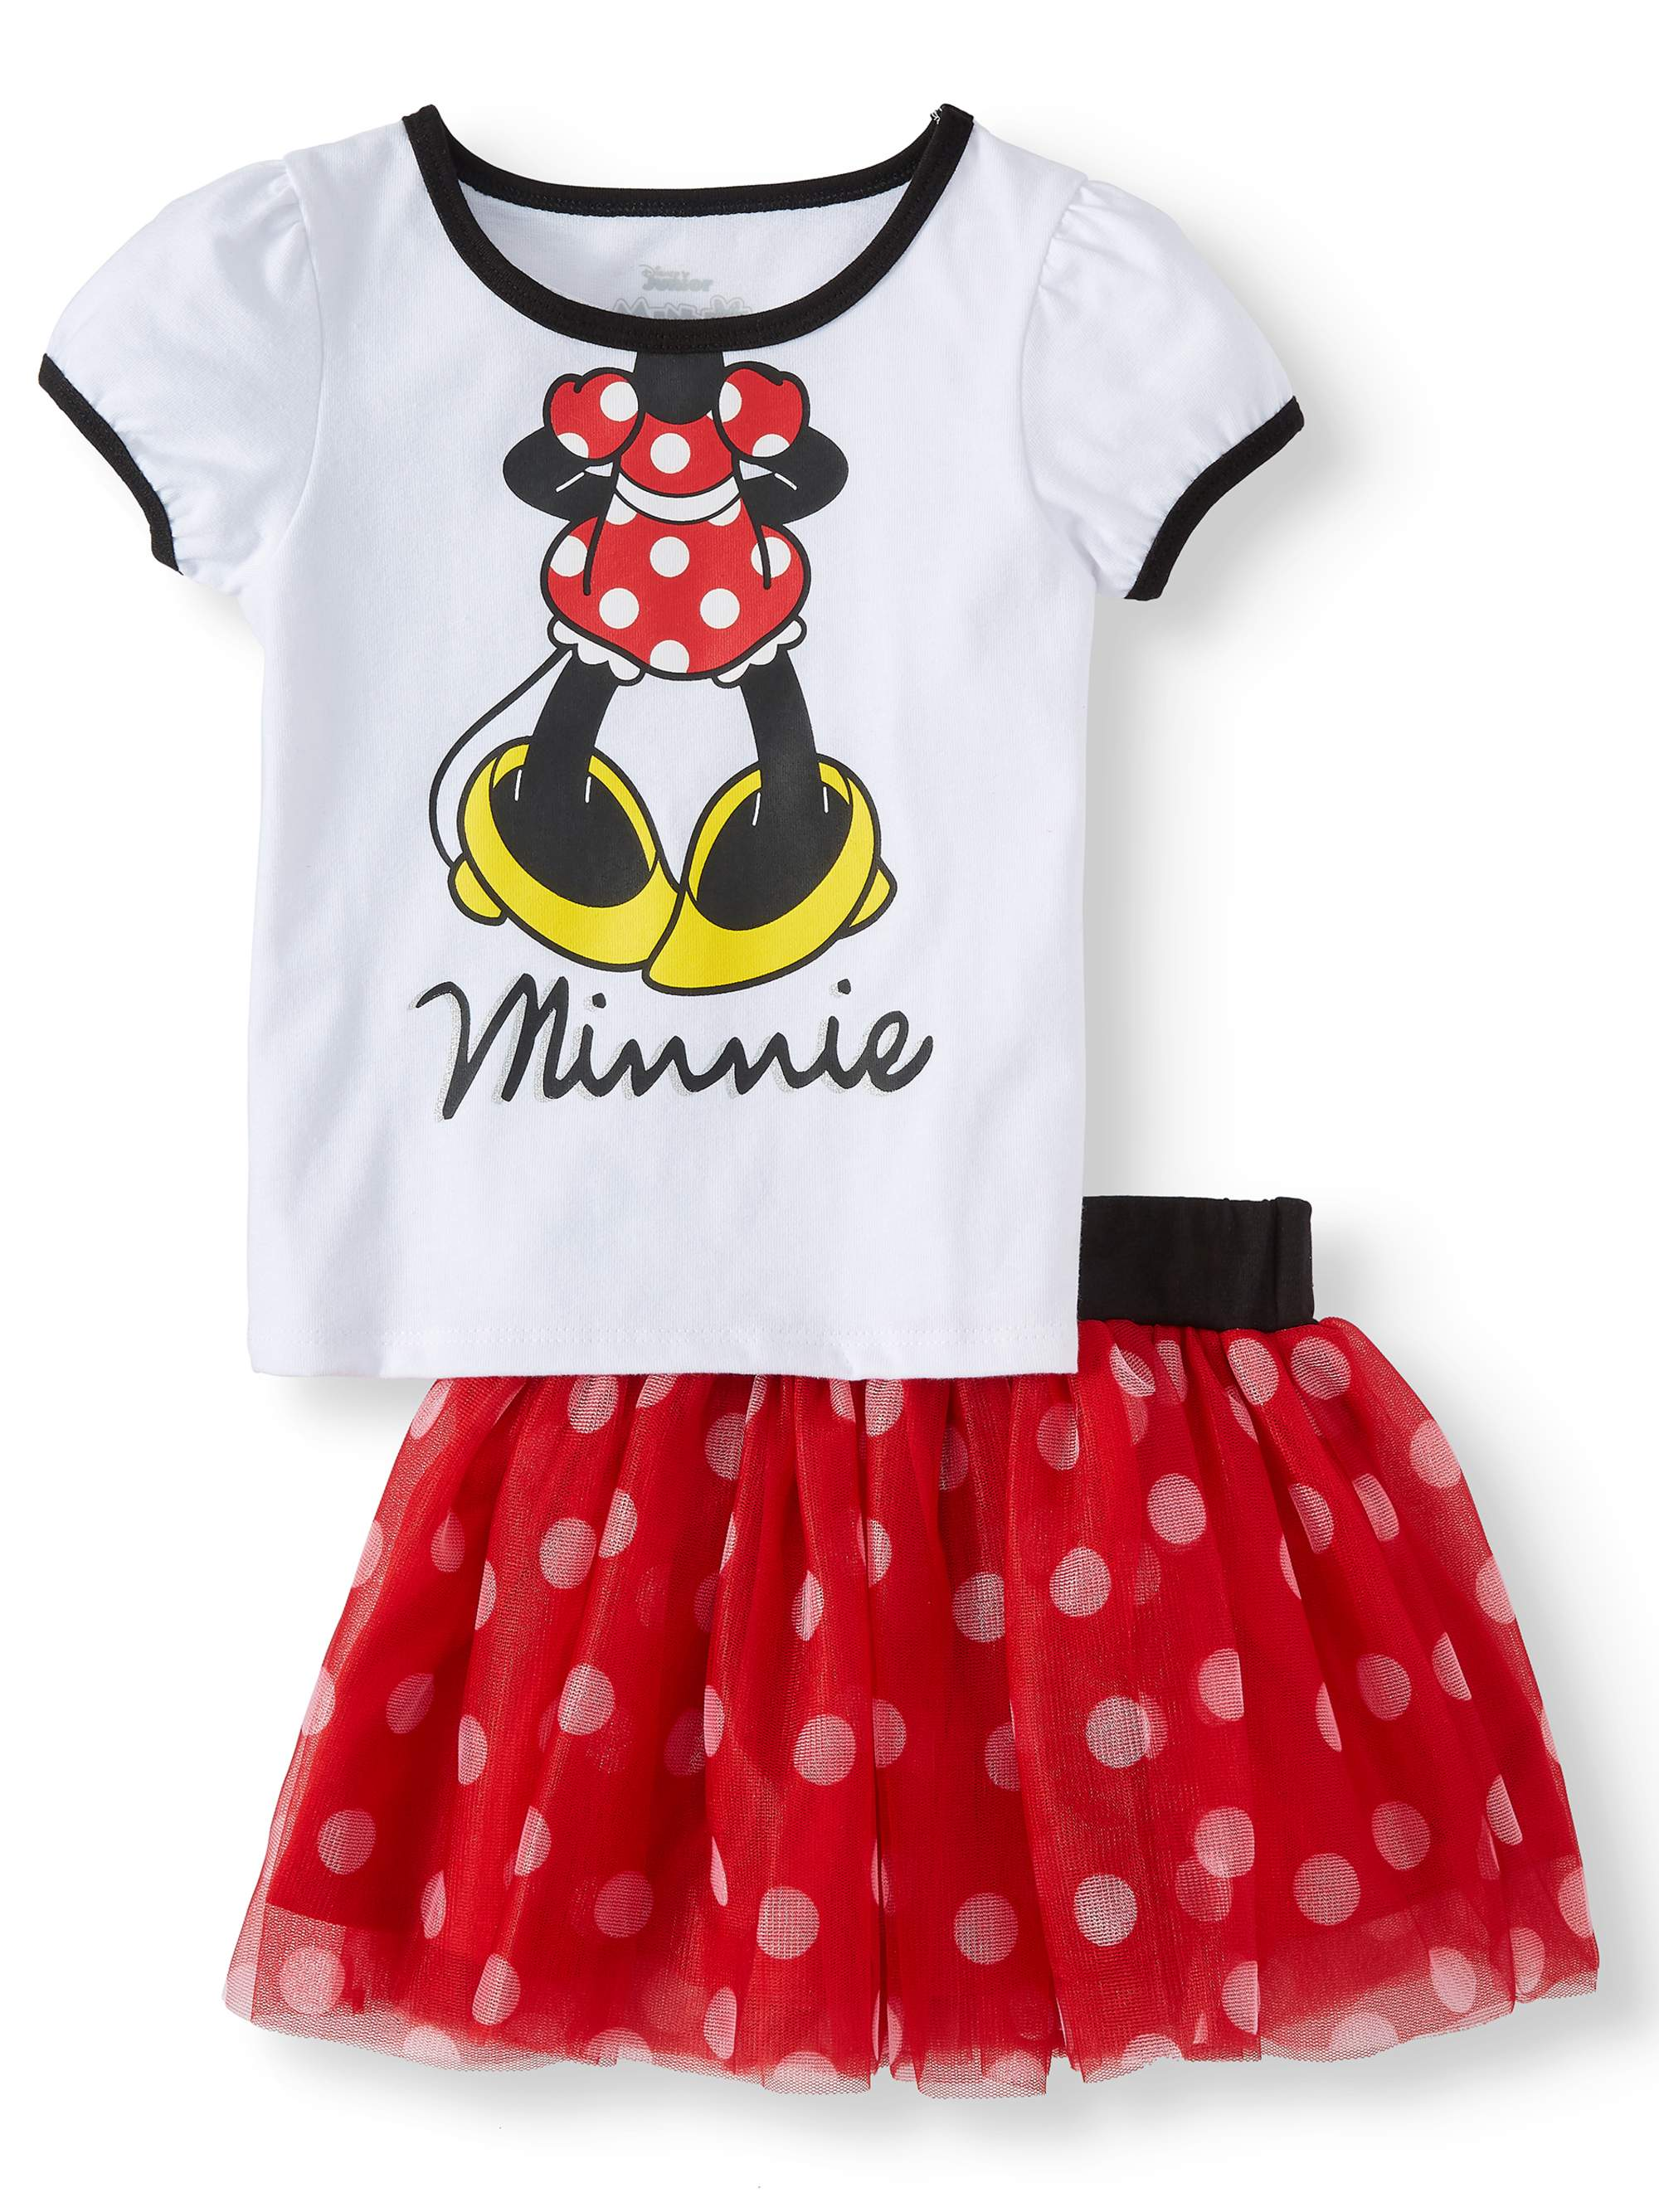 dbb89f0b Minnie Mouse T-Shirt, Tutu Skirt, & Headband, 3pc Outfit Set ...